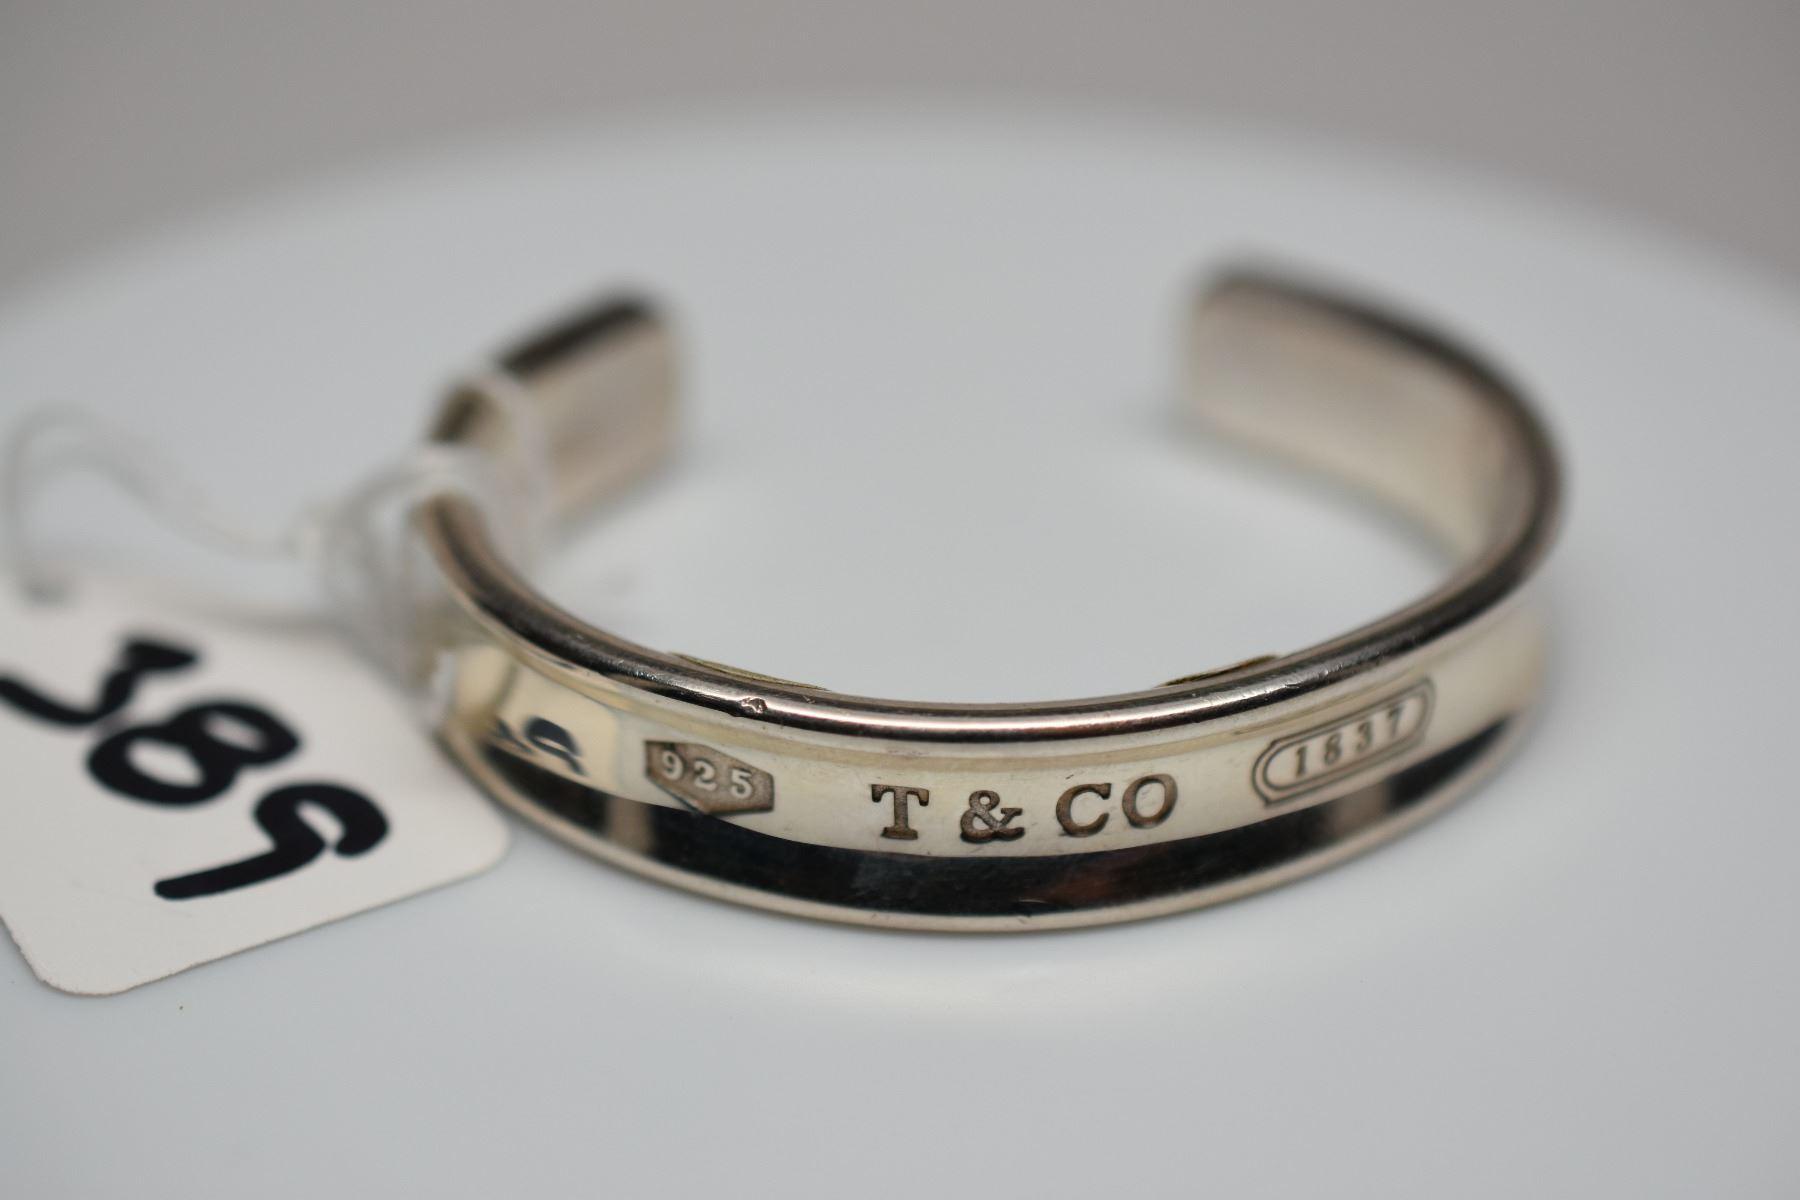 5d4351ed652f2 Tiffany & Co. Sterling Silver Bangle Bracelet 2 1/2